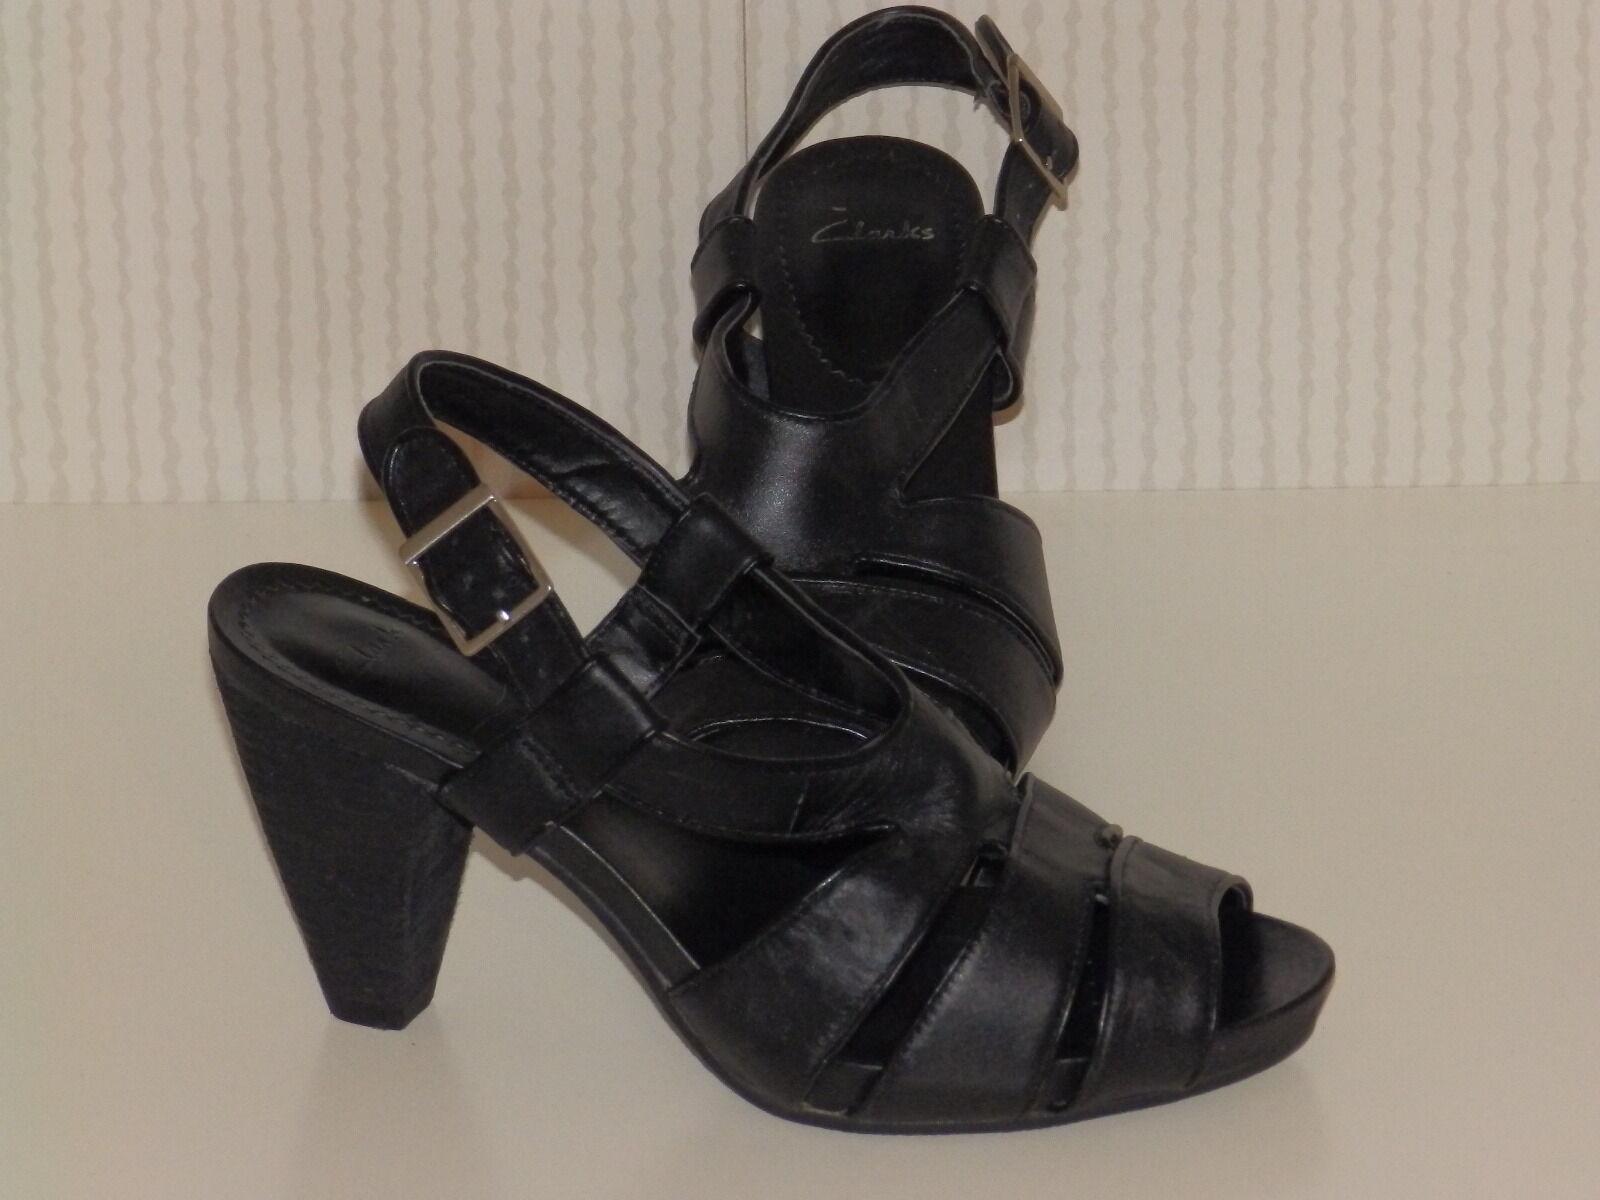 ff443132b5d57 Clarks leather sandals 5 uk size nagjty3204-Women's Heels - bota ...